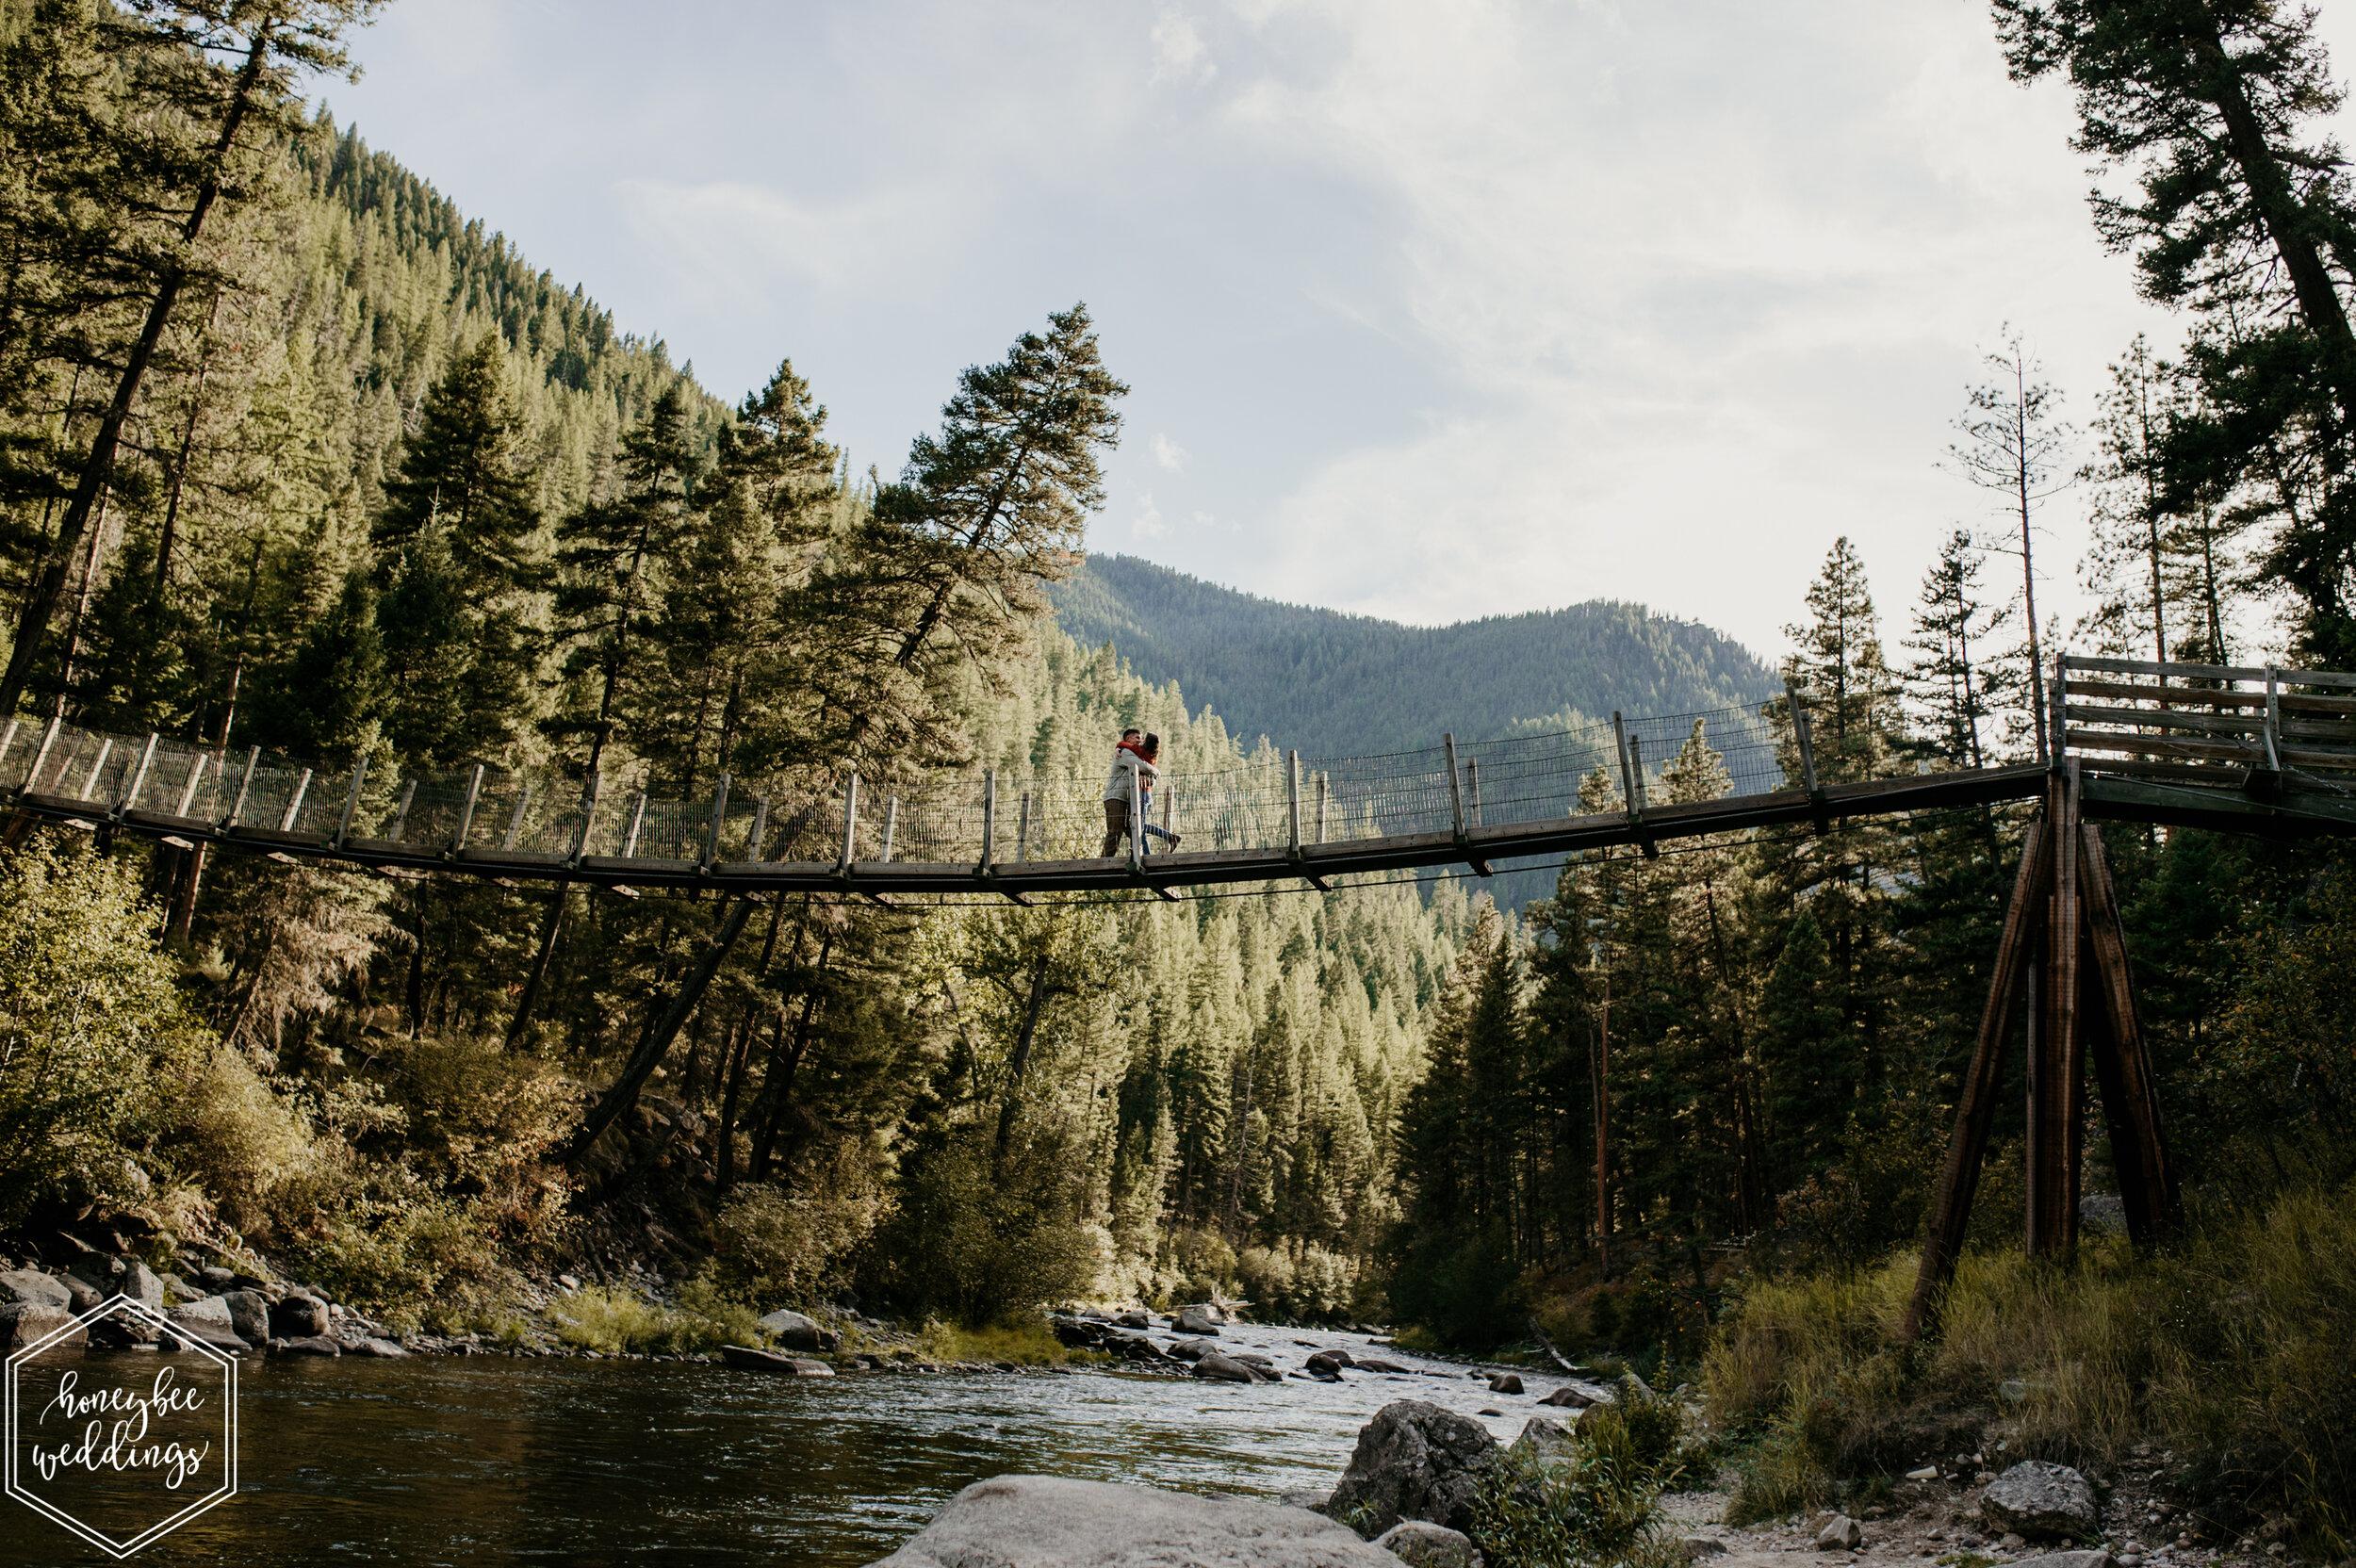 064Rock Creek Engagement_Fall Engaegment Session_Ann & Nick_September 22, 2019-377.jpg